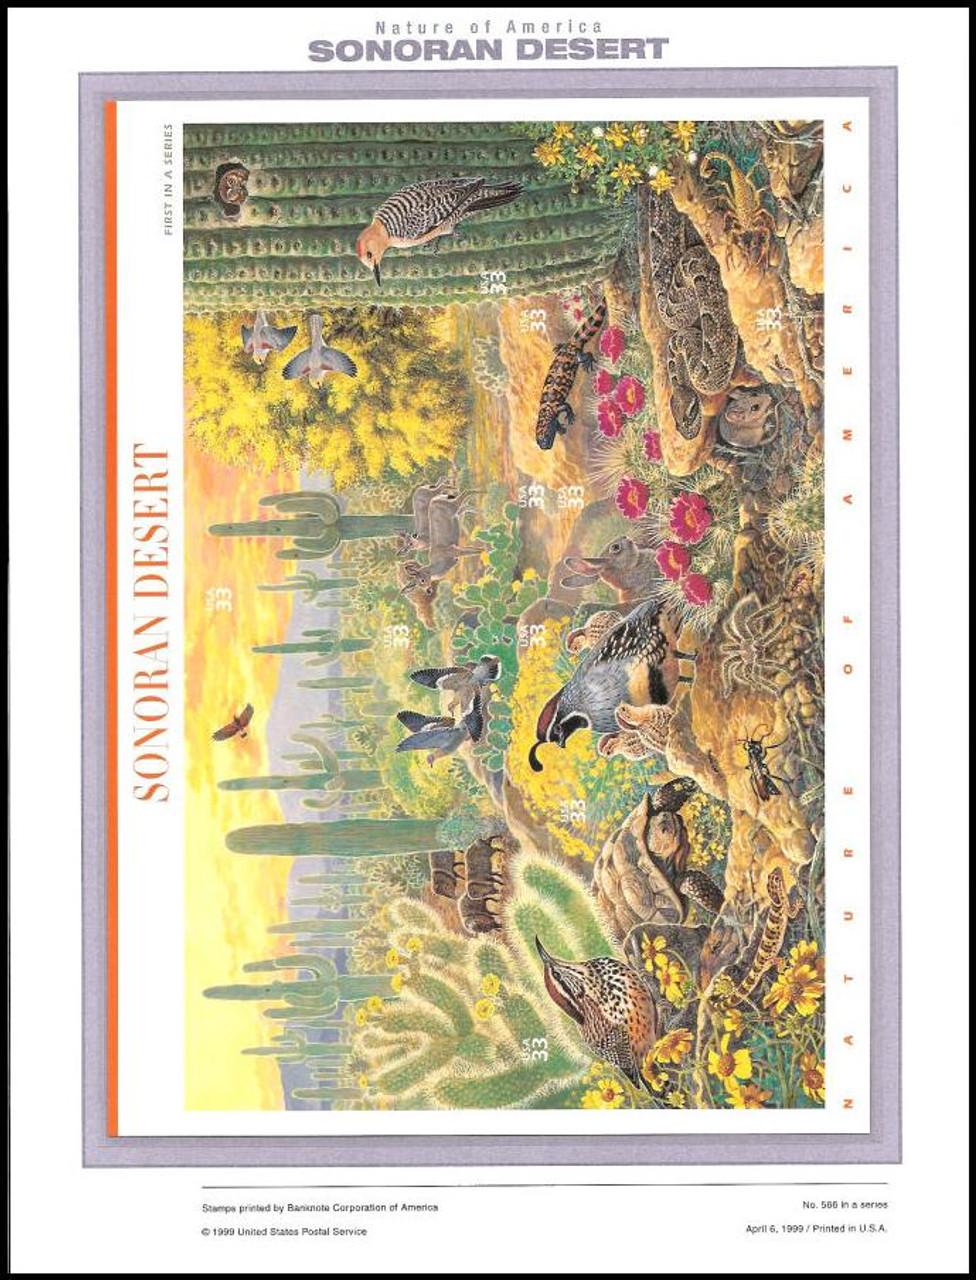 3293 / 33c Sonoran Desert Sheet of 10 ( 2 Panel Set ) 1999 USPS American Commemorative Panel Sealed #566